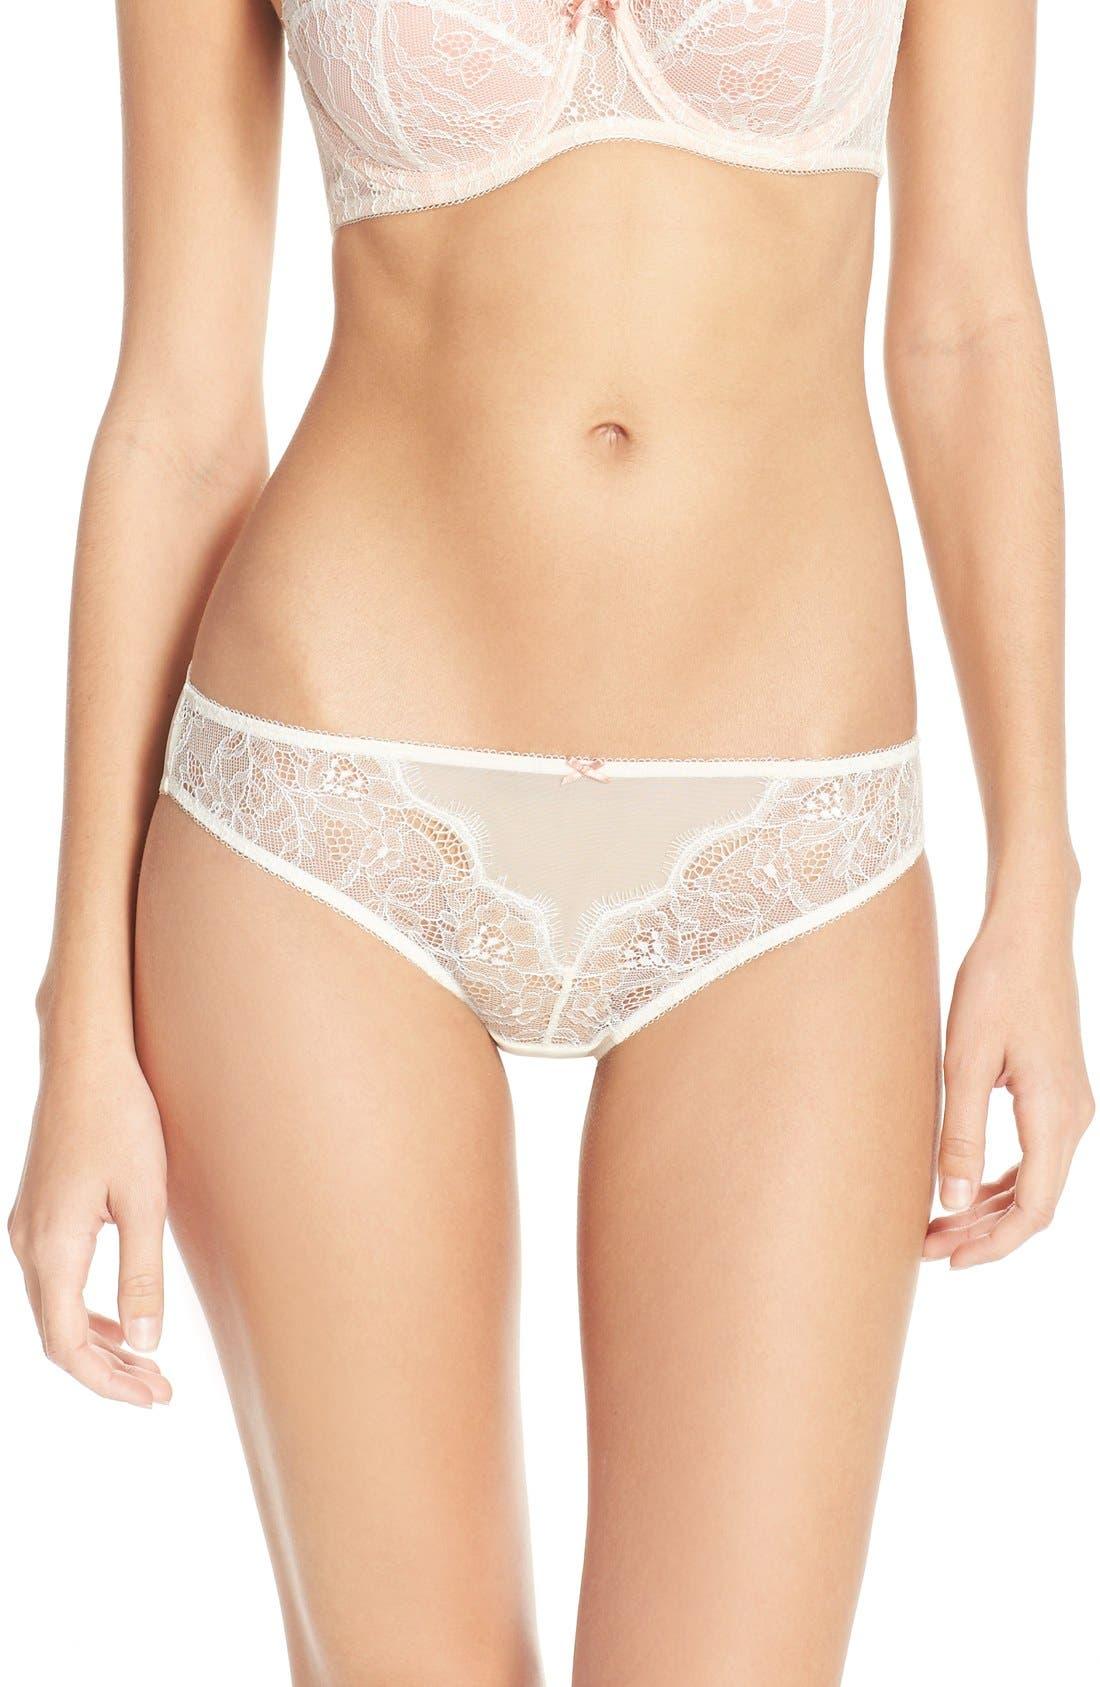 Alternate Image 1 Selected - b.tempt'd by Wacoal 'B Sultry' Bikini